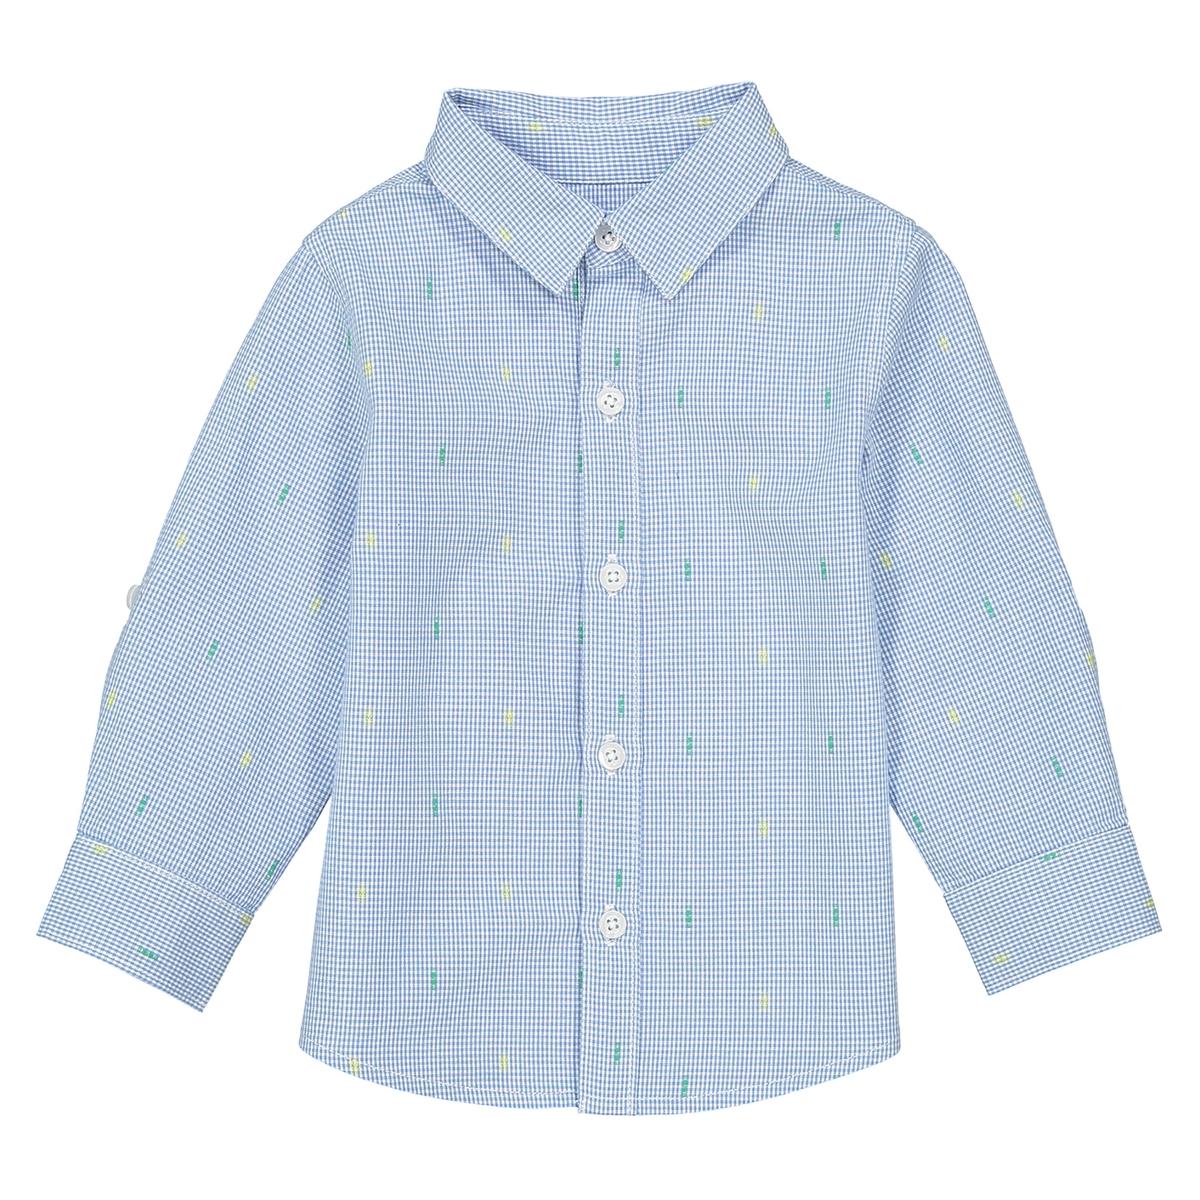 Camicia fantasia maniche lunghe - 1 mese - 3 anni